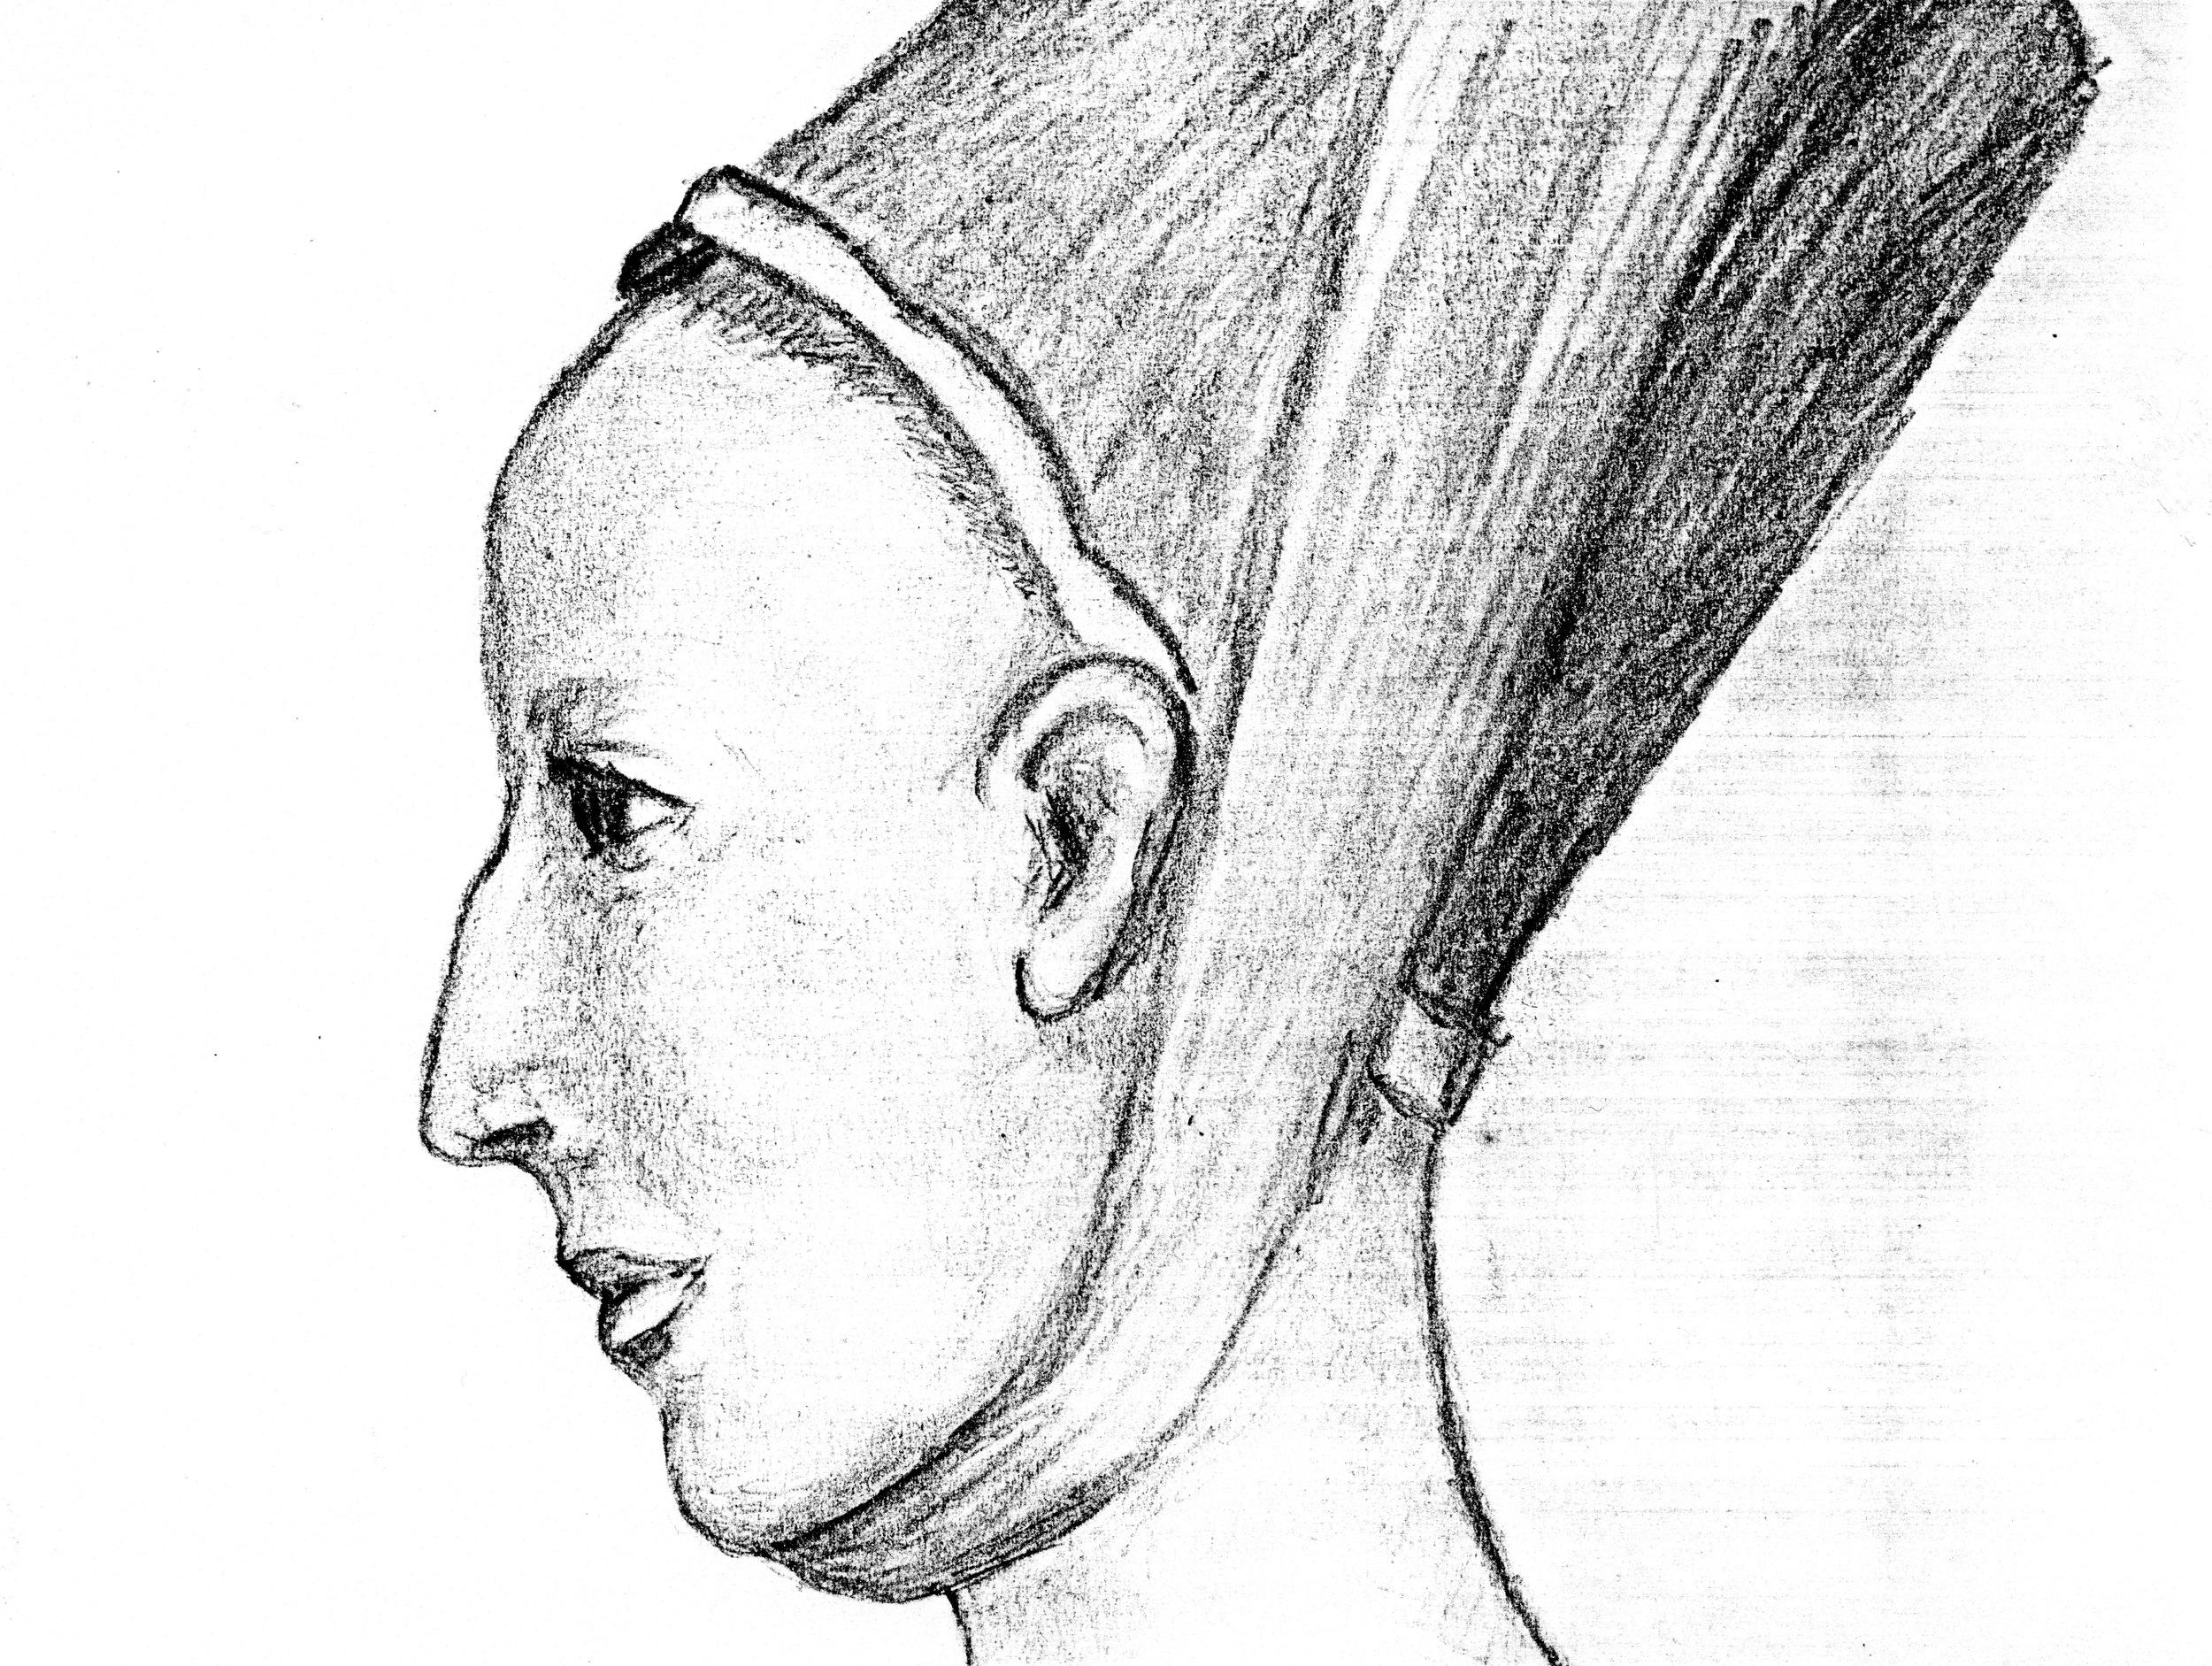 John Ashdown-Hill's image of Eleanor, based on the Norwich skull